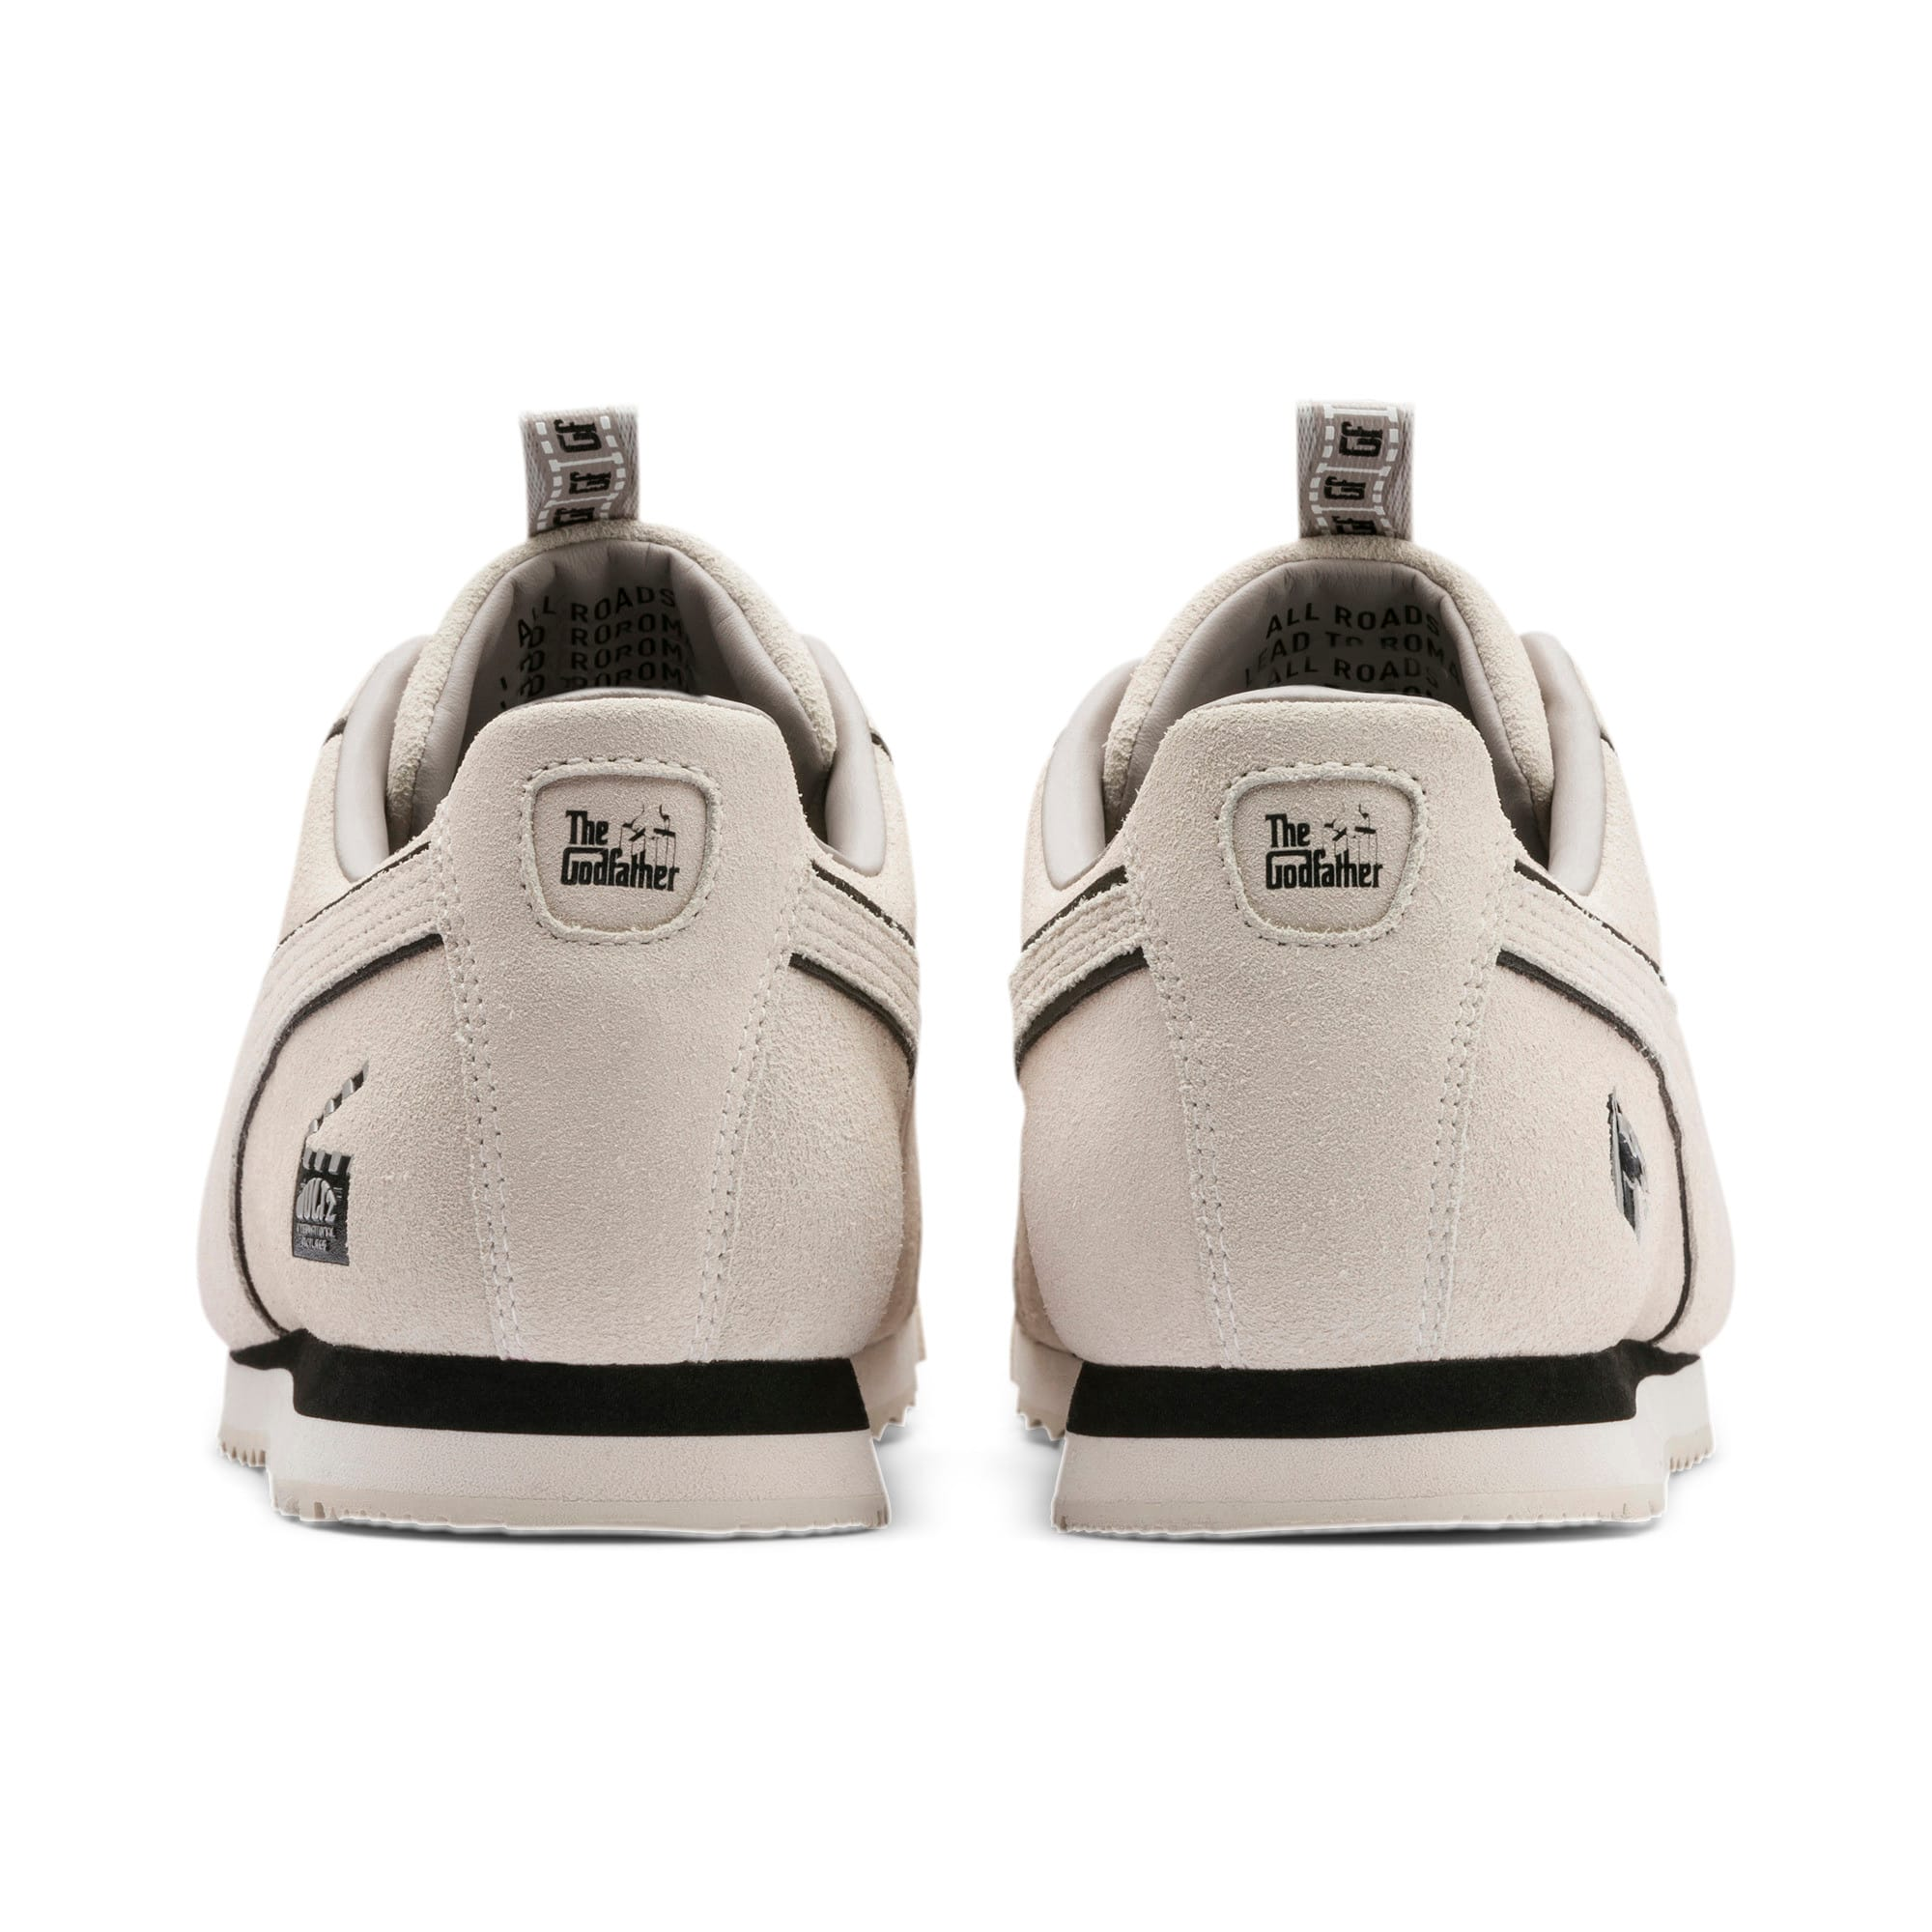 Miniatura 3 de Zapatos deportivos PUMA x THE GODFATHER Roma Woltz, WINDCHIME-Puma negro, mediano